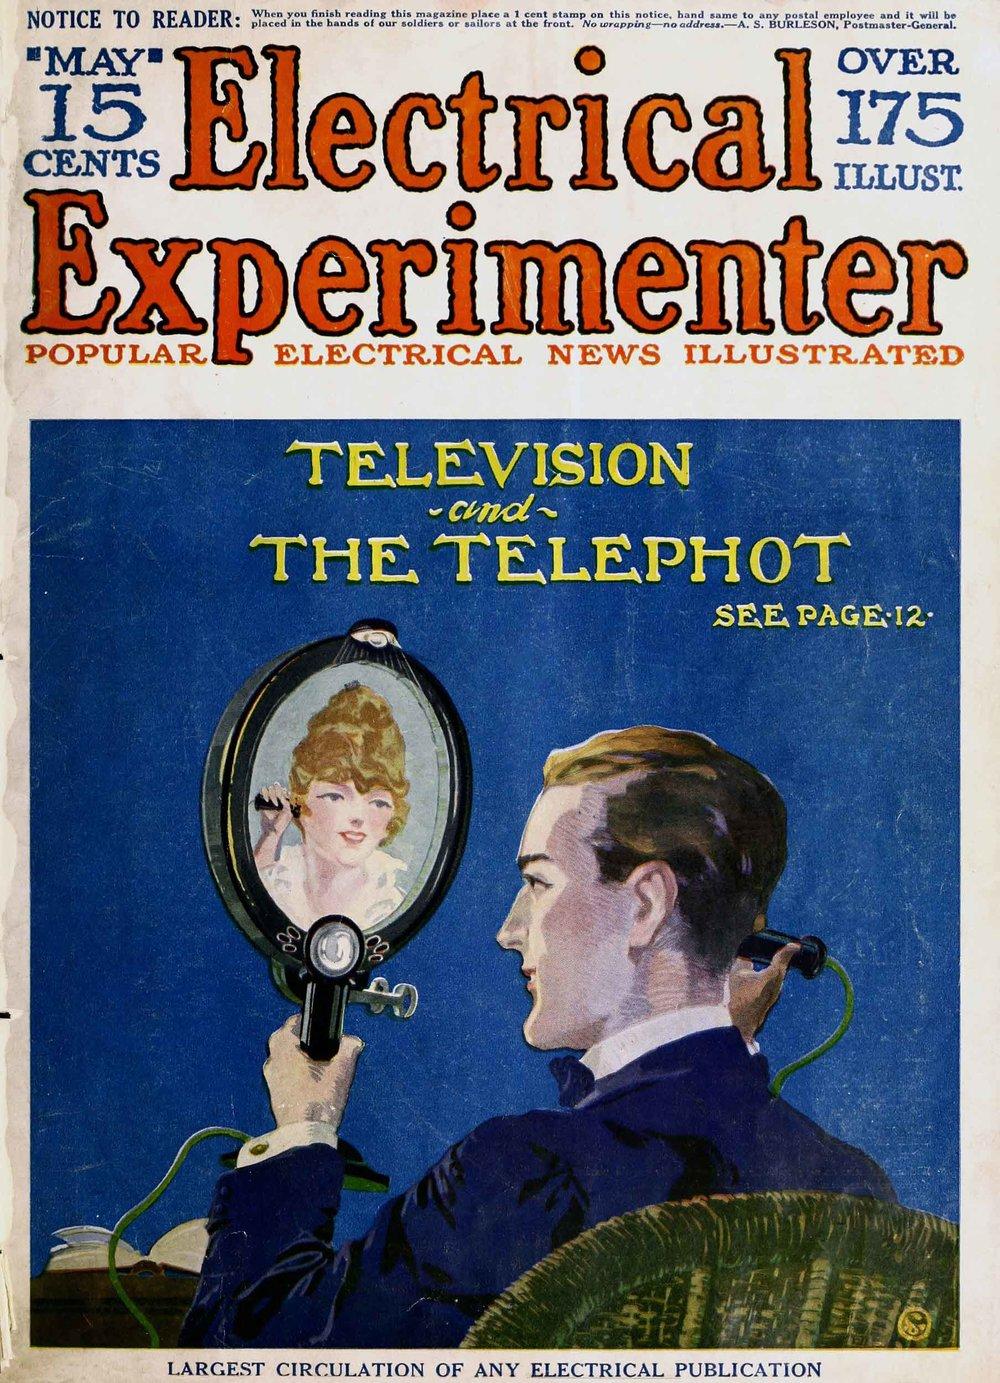 05_Magazine_Telephot_ElectricExp.jpg